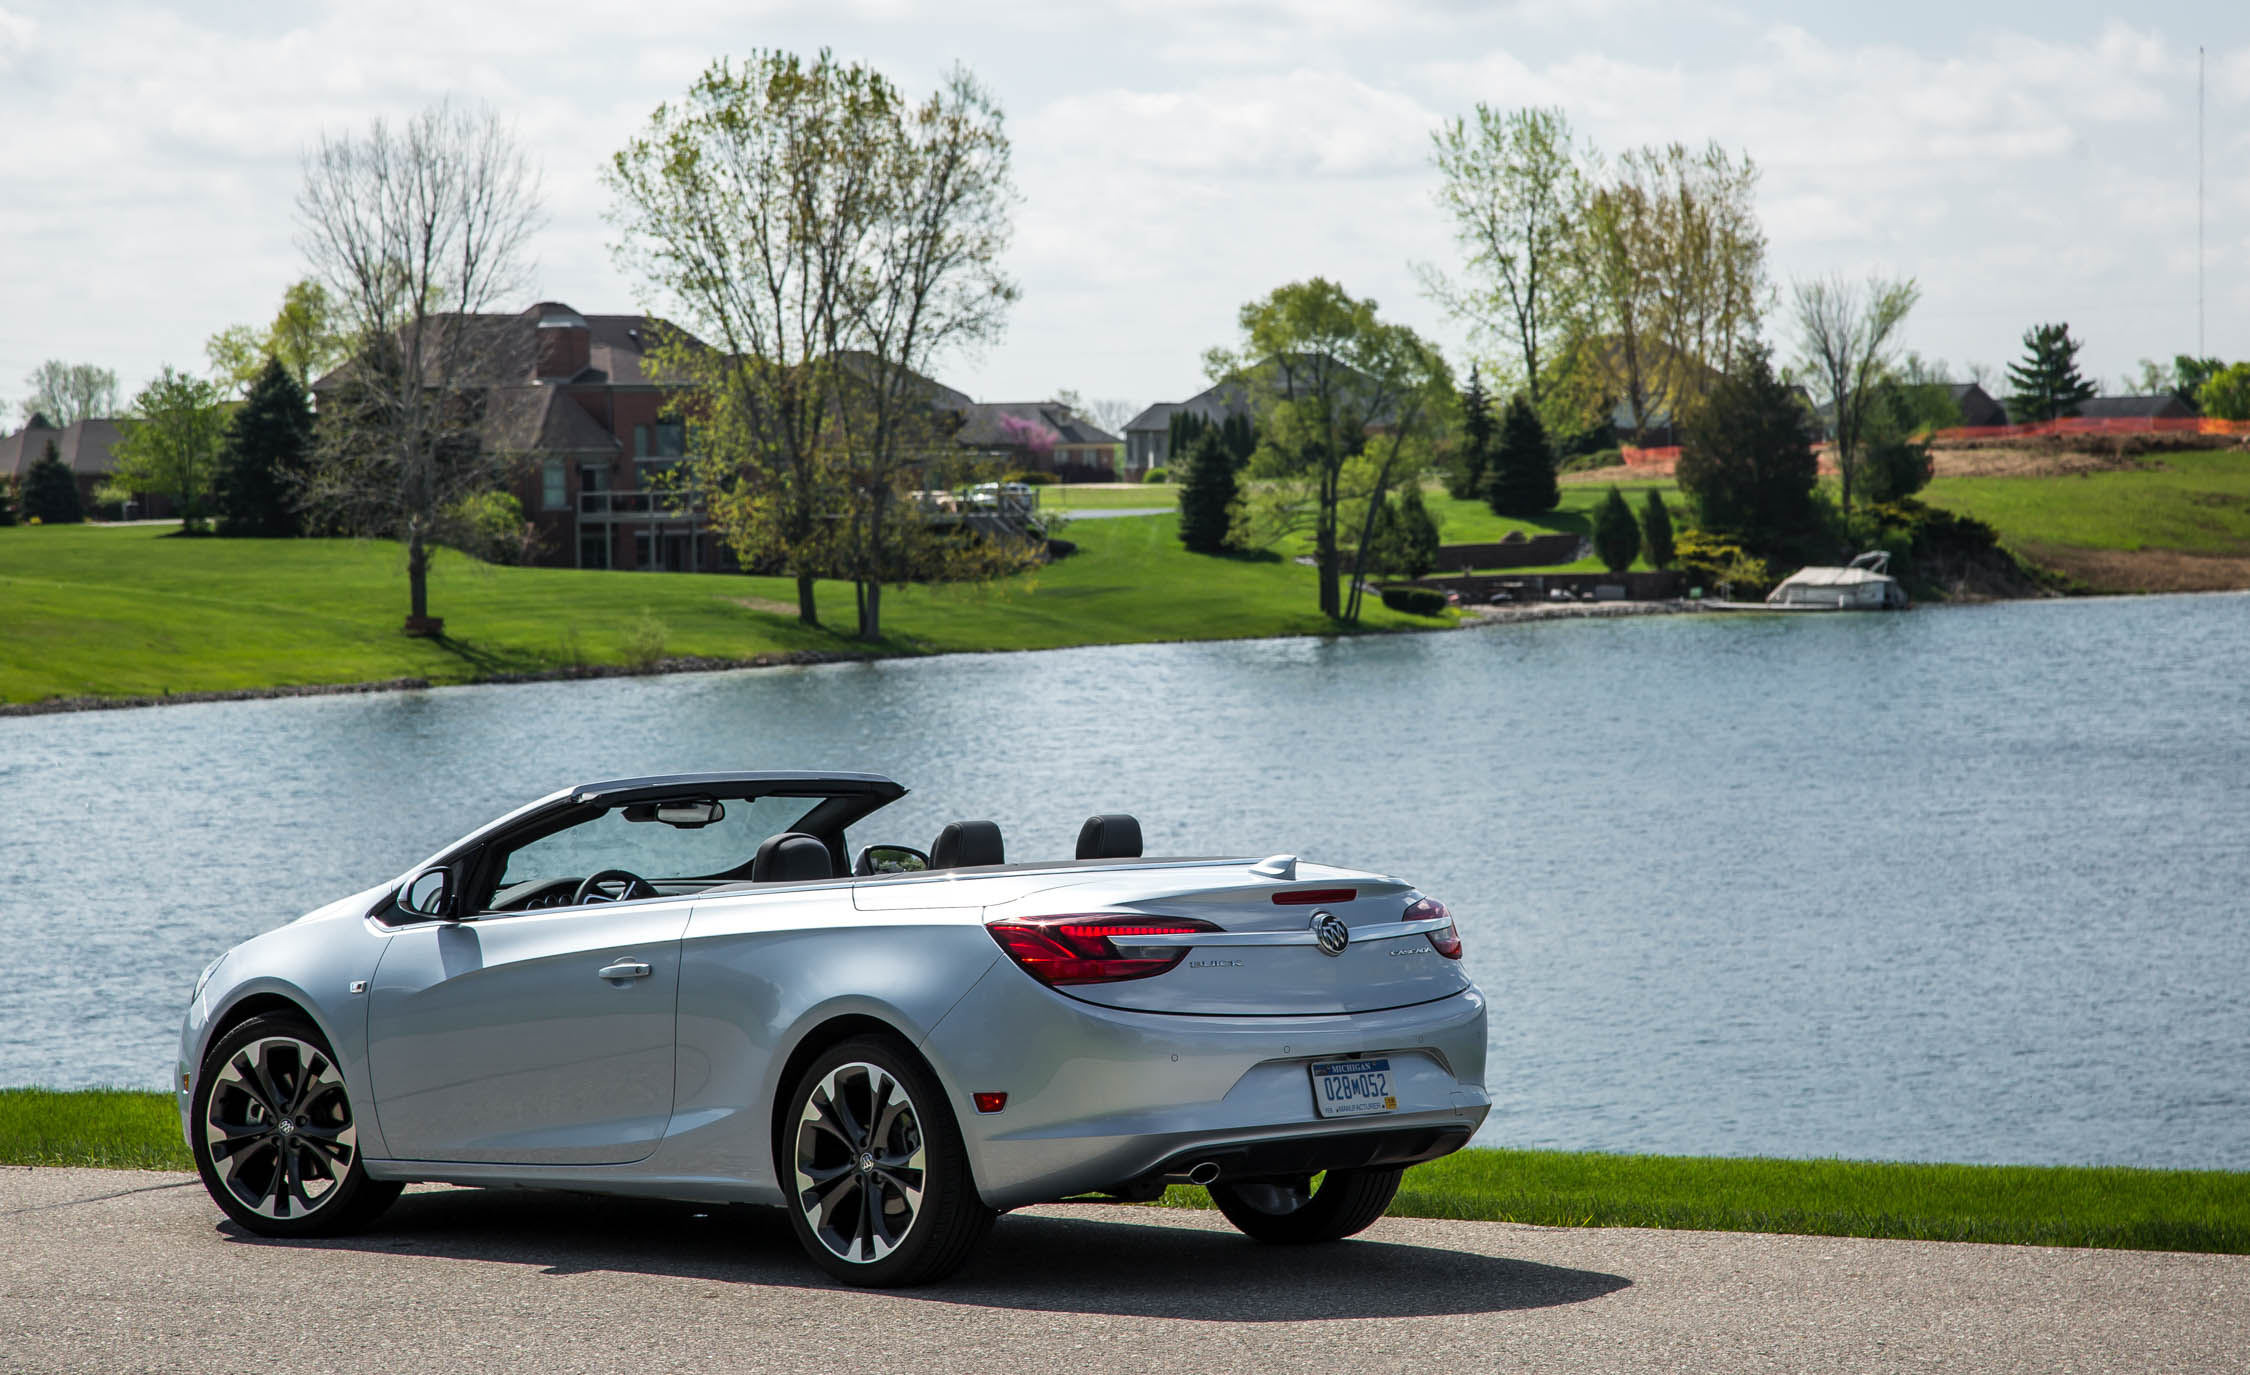 2016 Buick Cascada Premium (Photo 3 of 24)